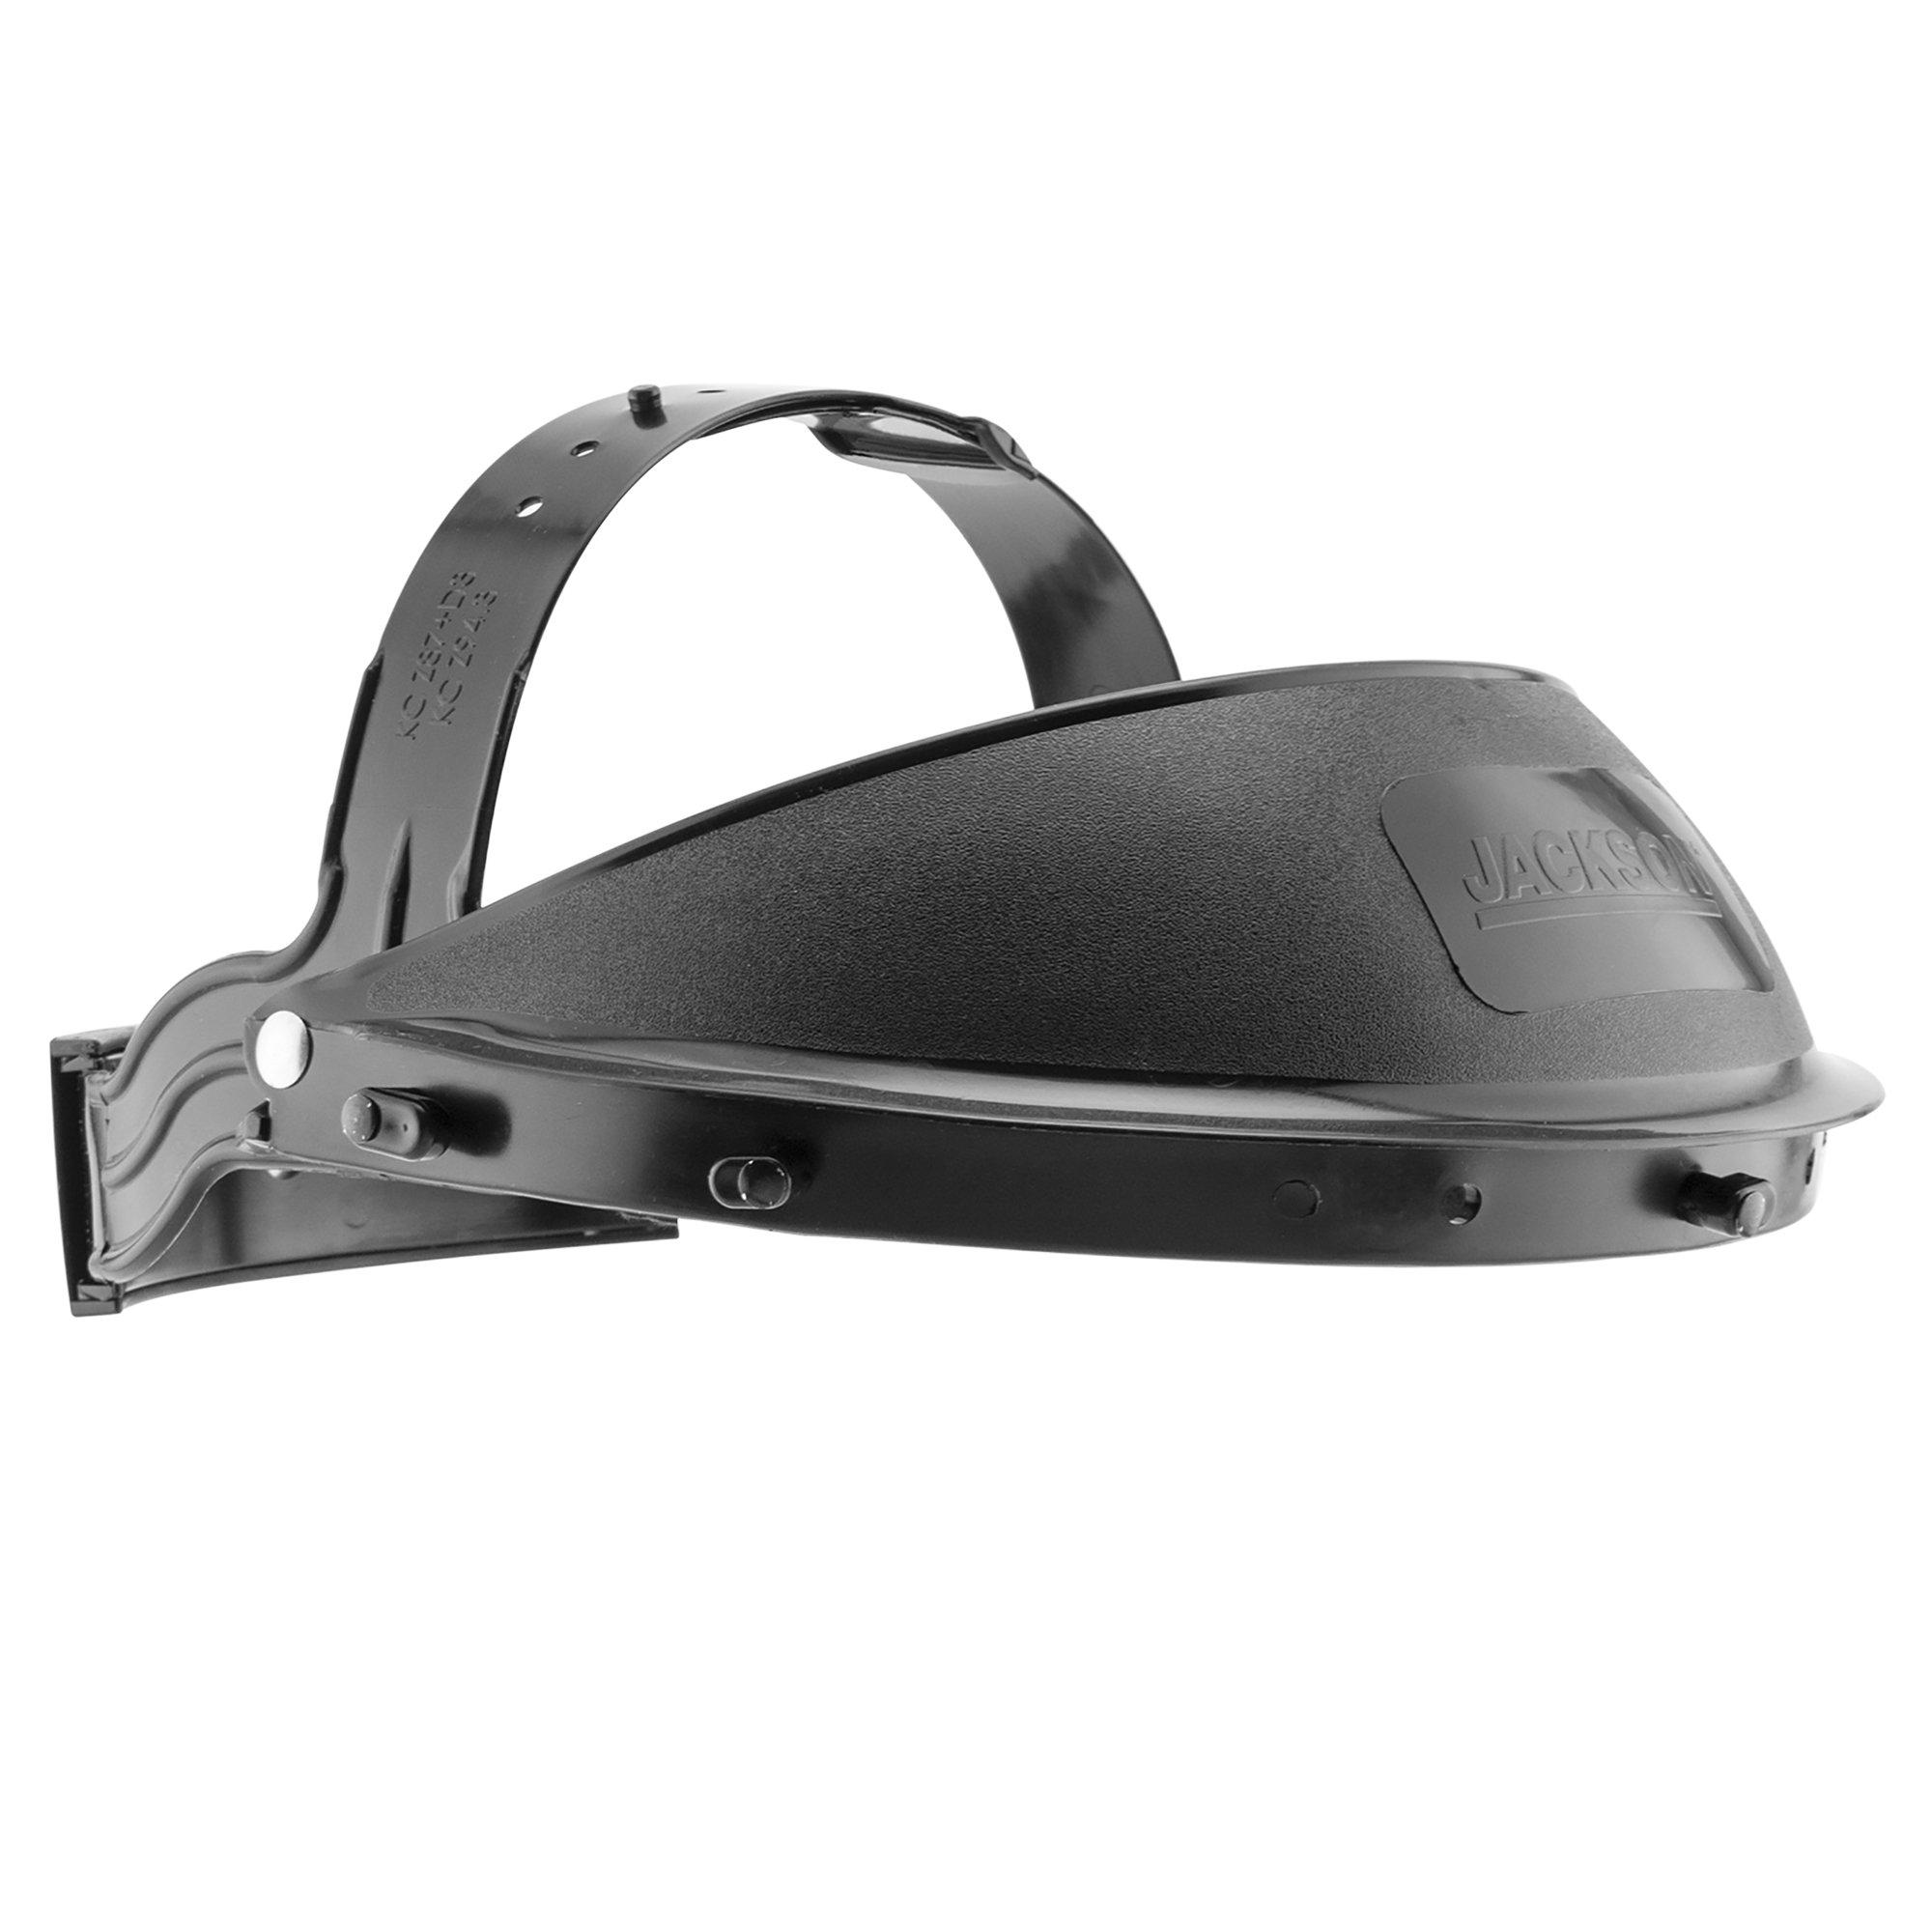 "Jackson Safety Headgear KDG10 K-Facesaver (14381), Ratchet Suspension, for 12"" or 15.5"" Face Shields, Cushioned Sweatband, Black, 12 Units / Case"